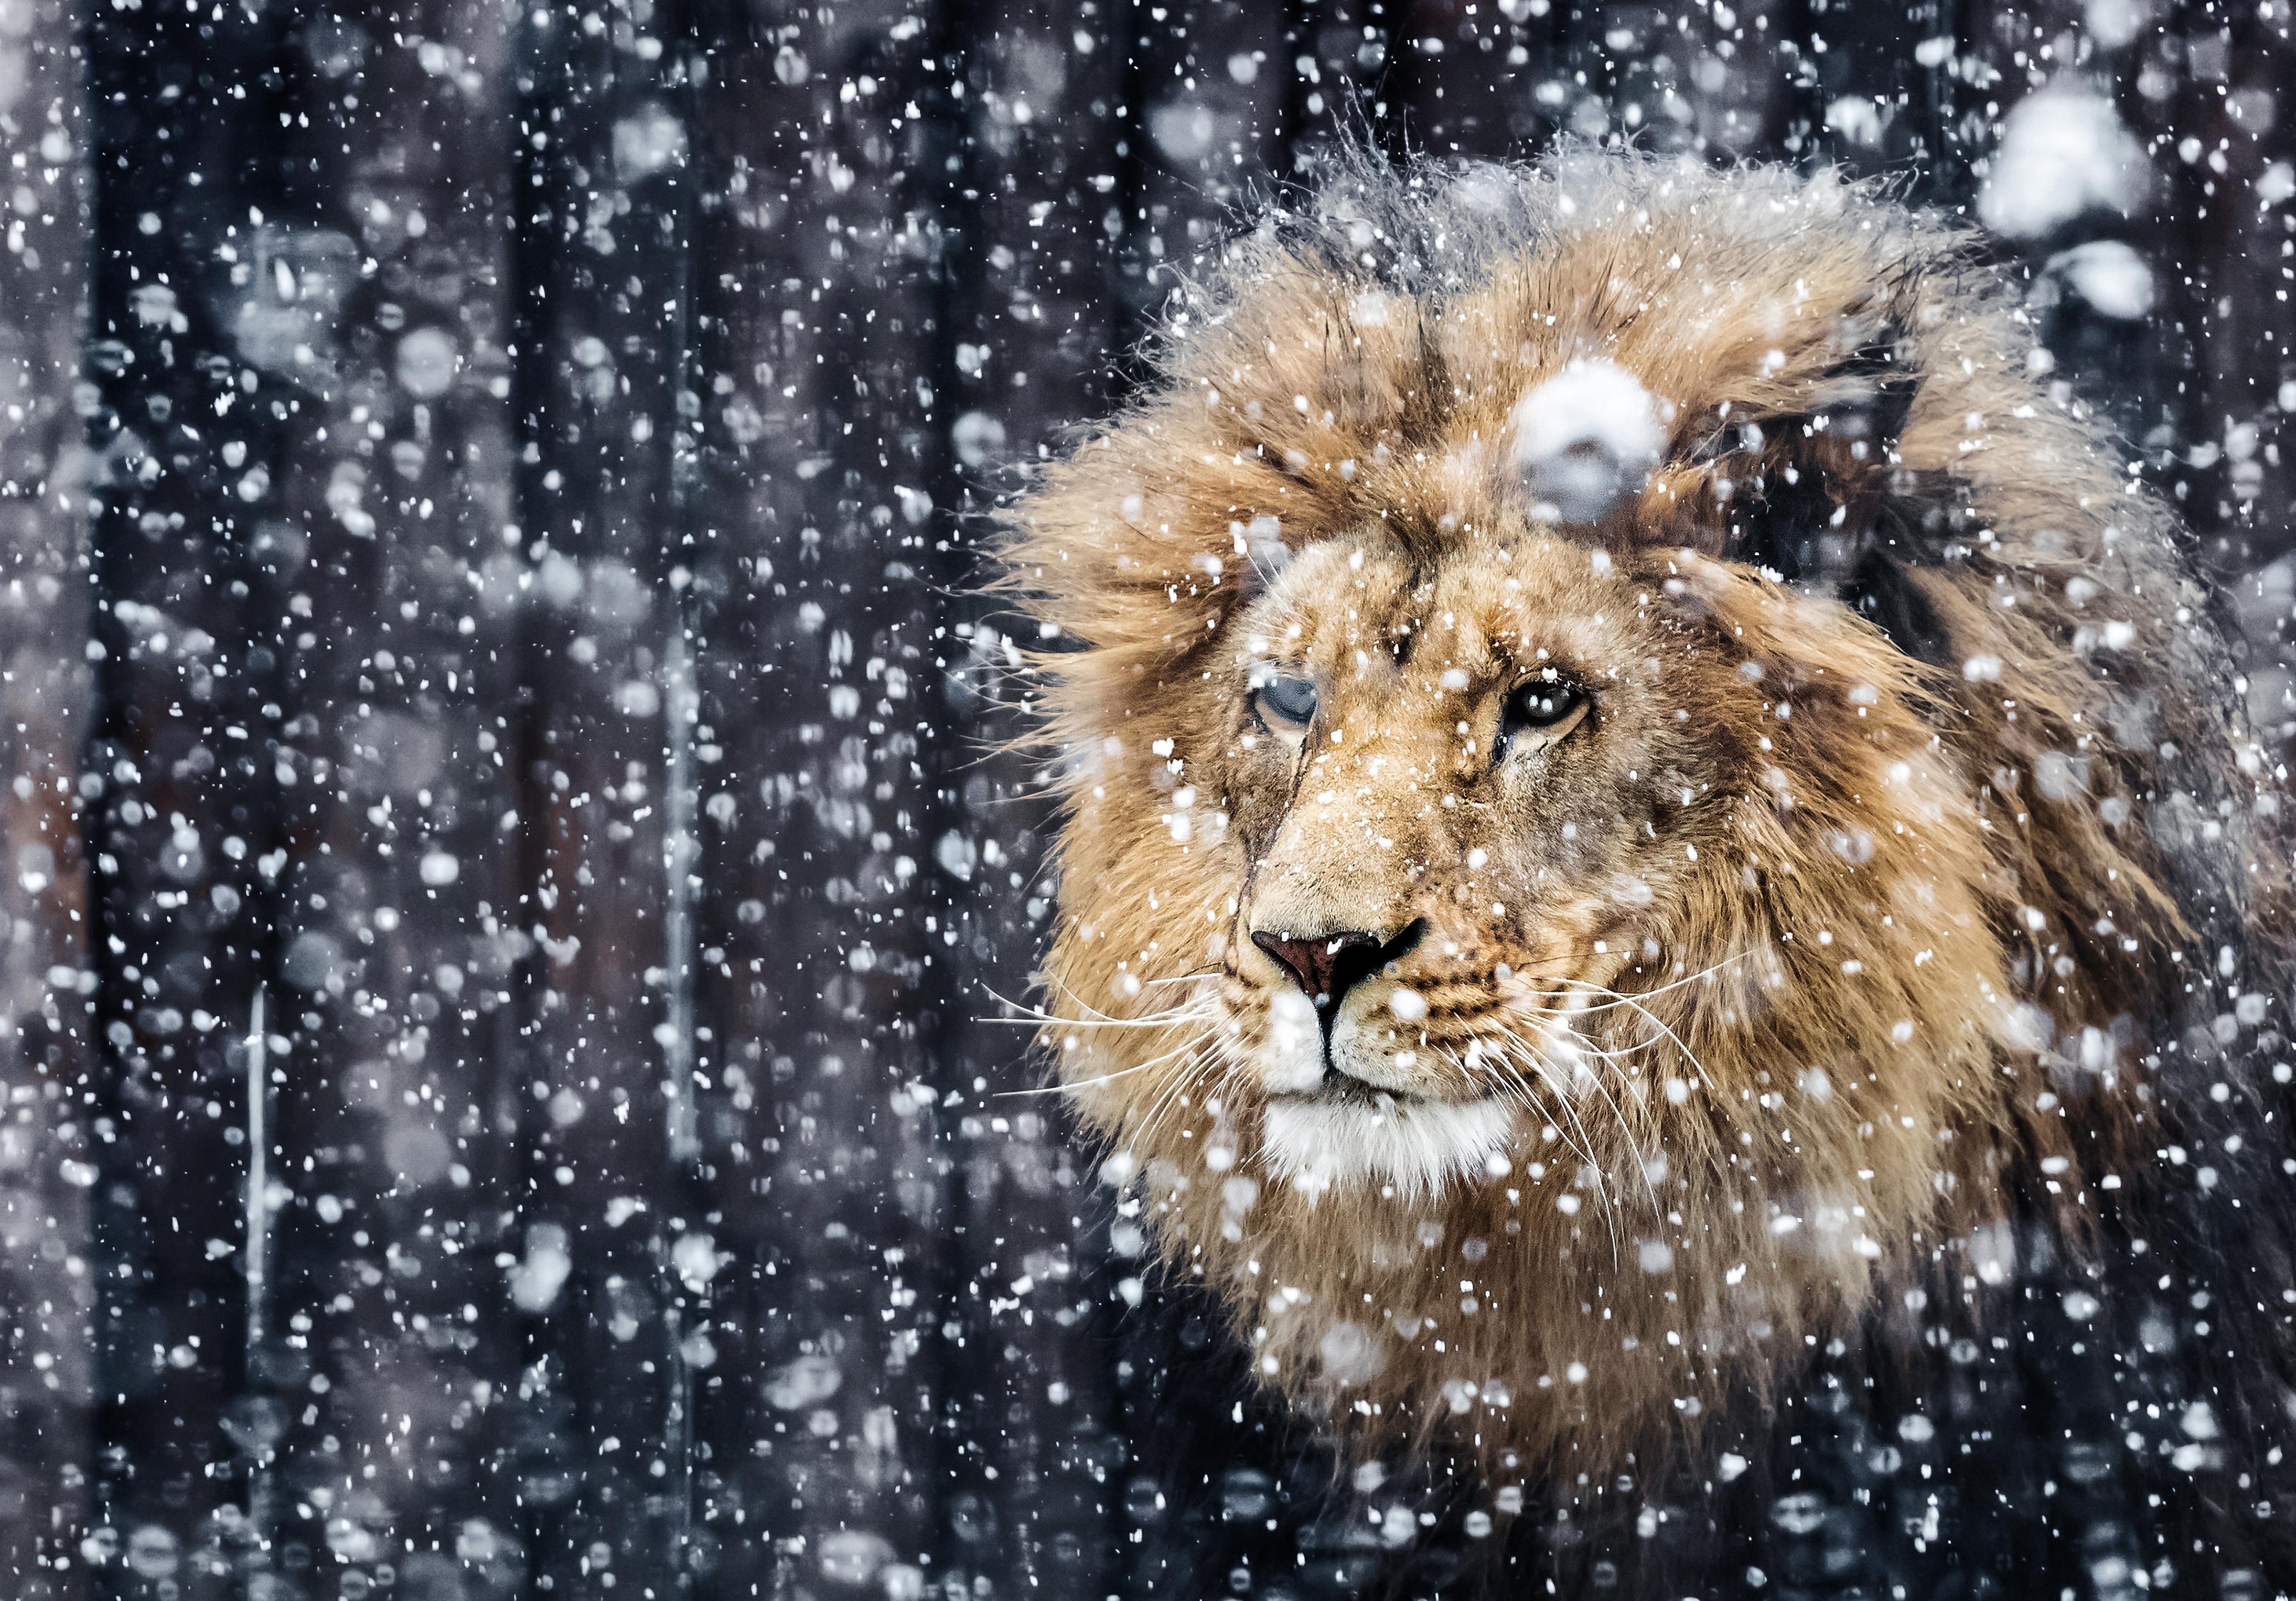 Portrait Of A Beautiful Lion Winter Edition Hd Wallpaper